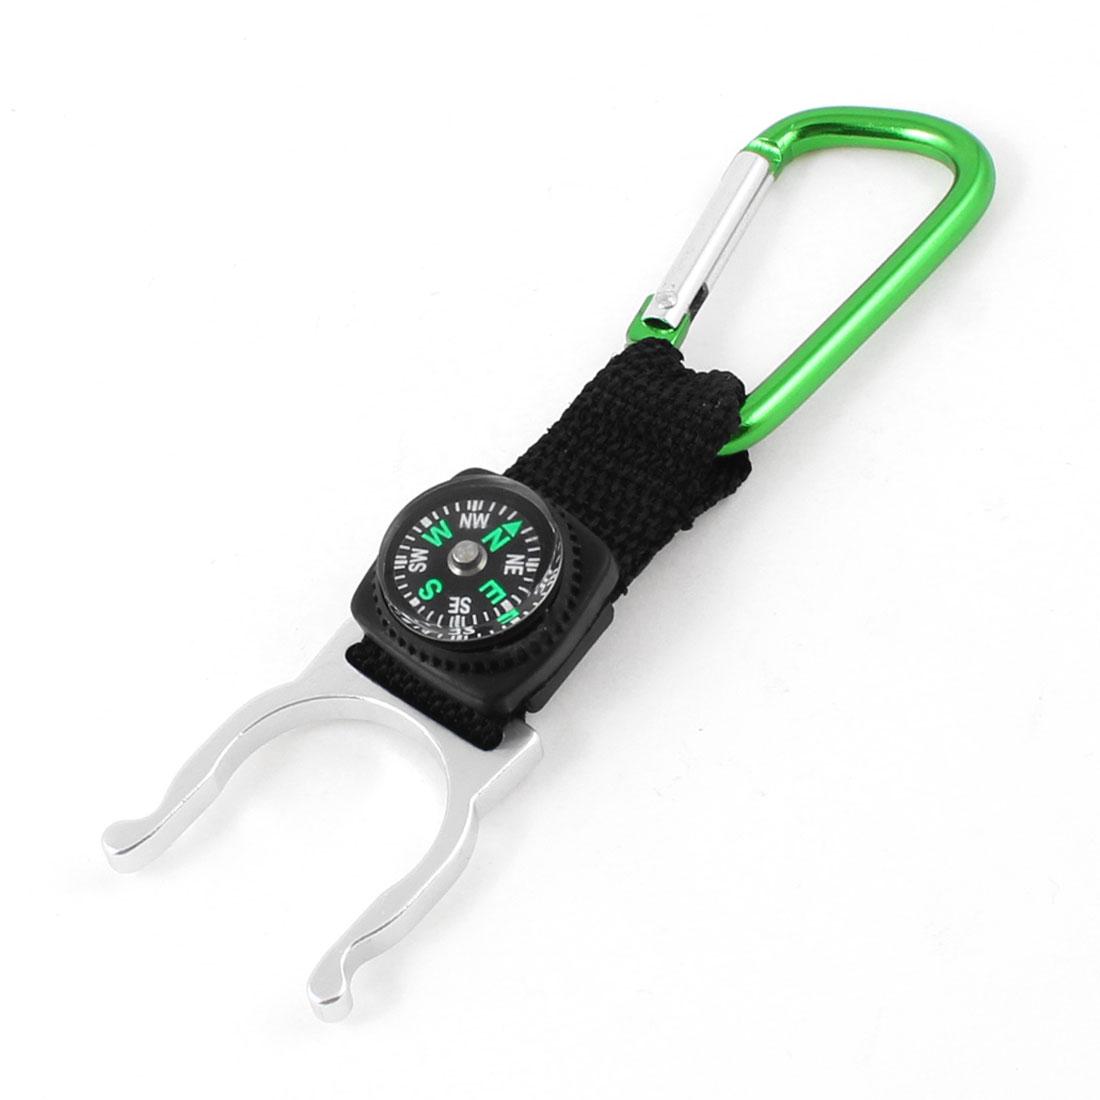 Green Aluminum Alloy Carabiner Hook Water Bottle Holder w Compass